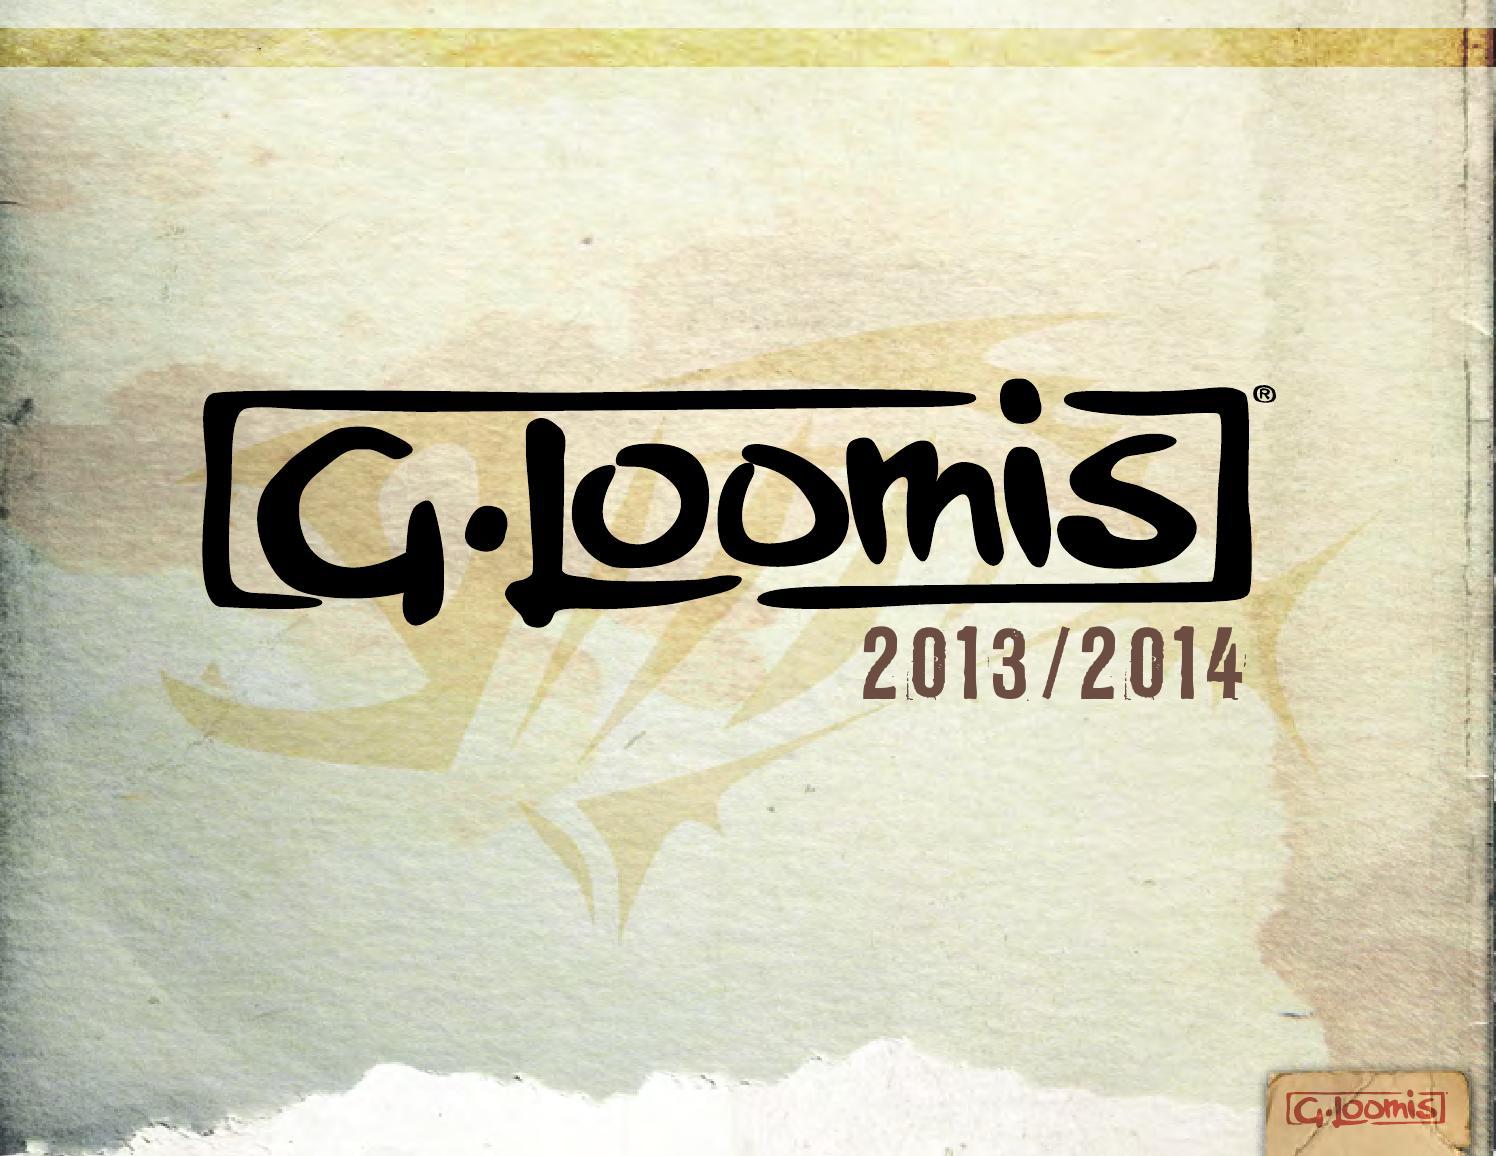 "G Loomis Pro-Green Saltwater Spinning Rod PGR822S 6/'10/"" Medium 1pc"